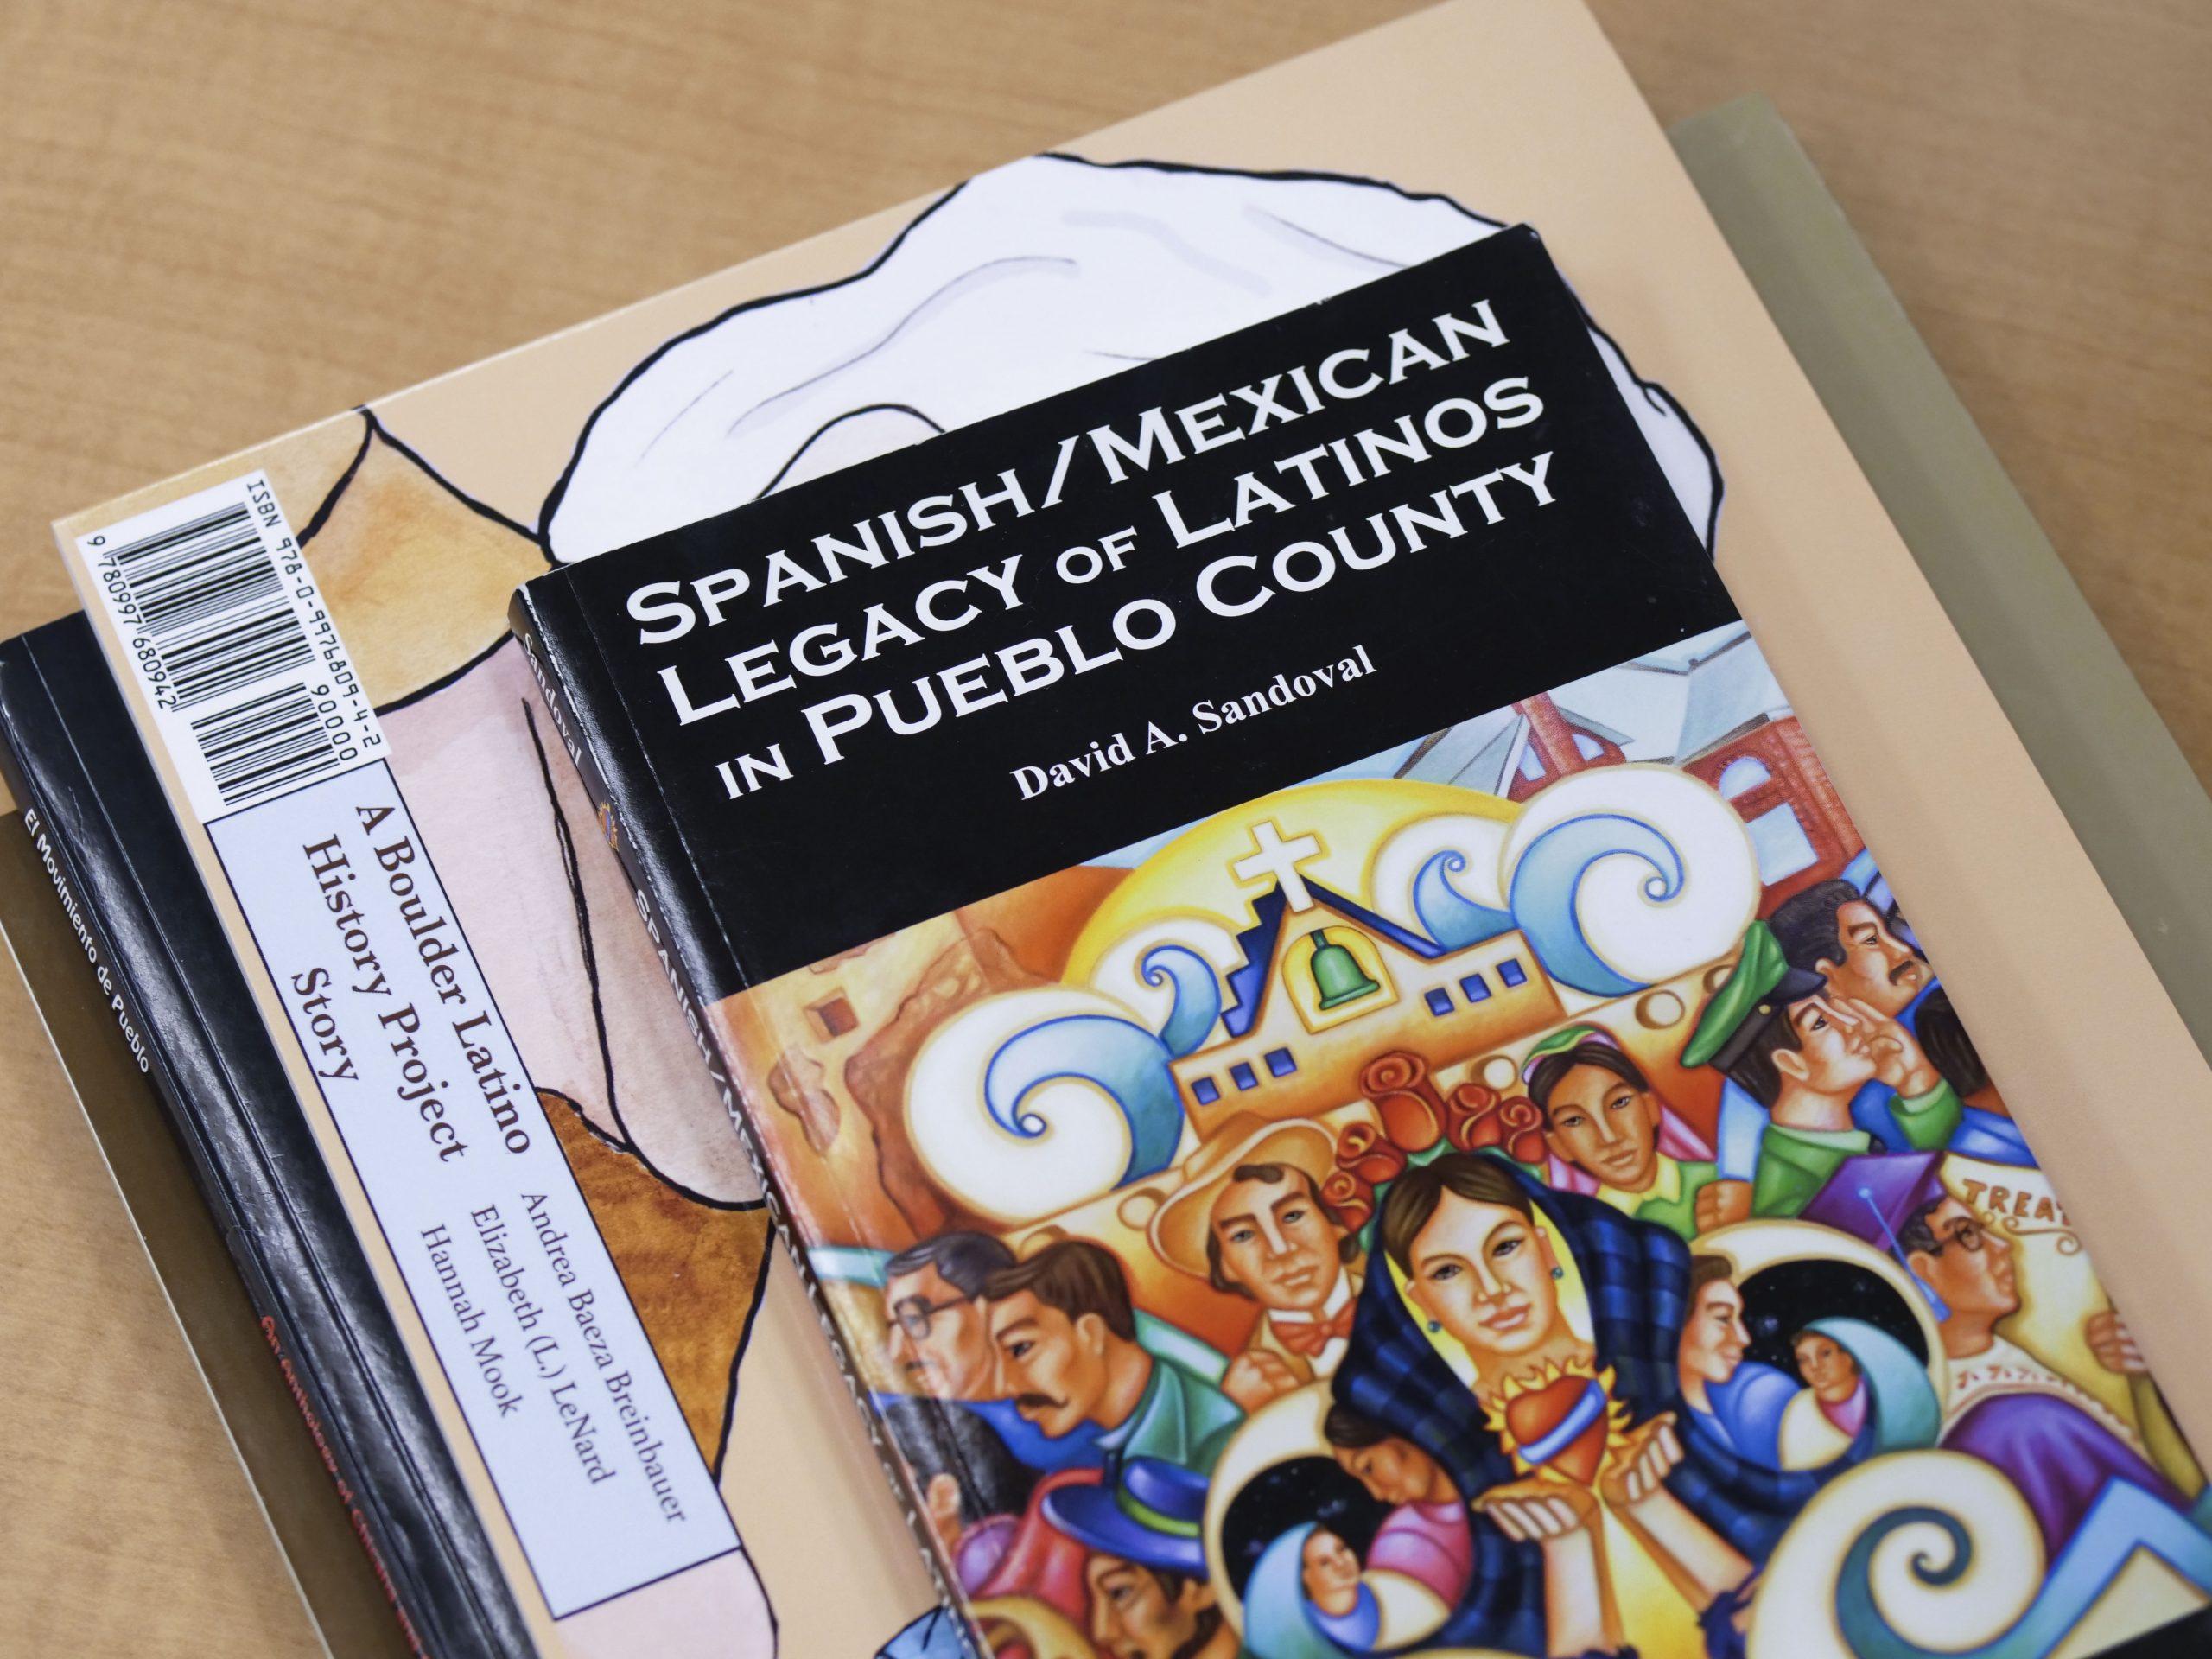 Books on Latino history.